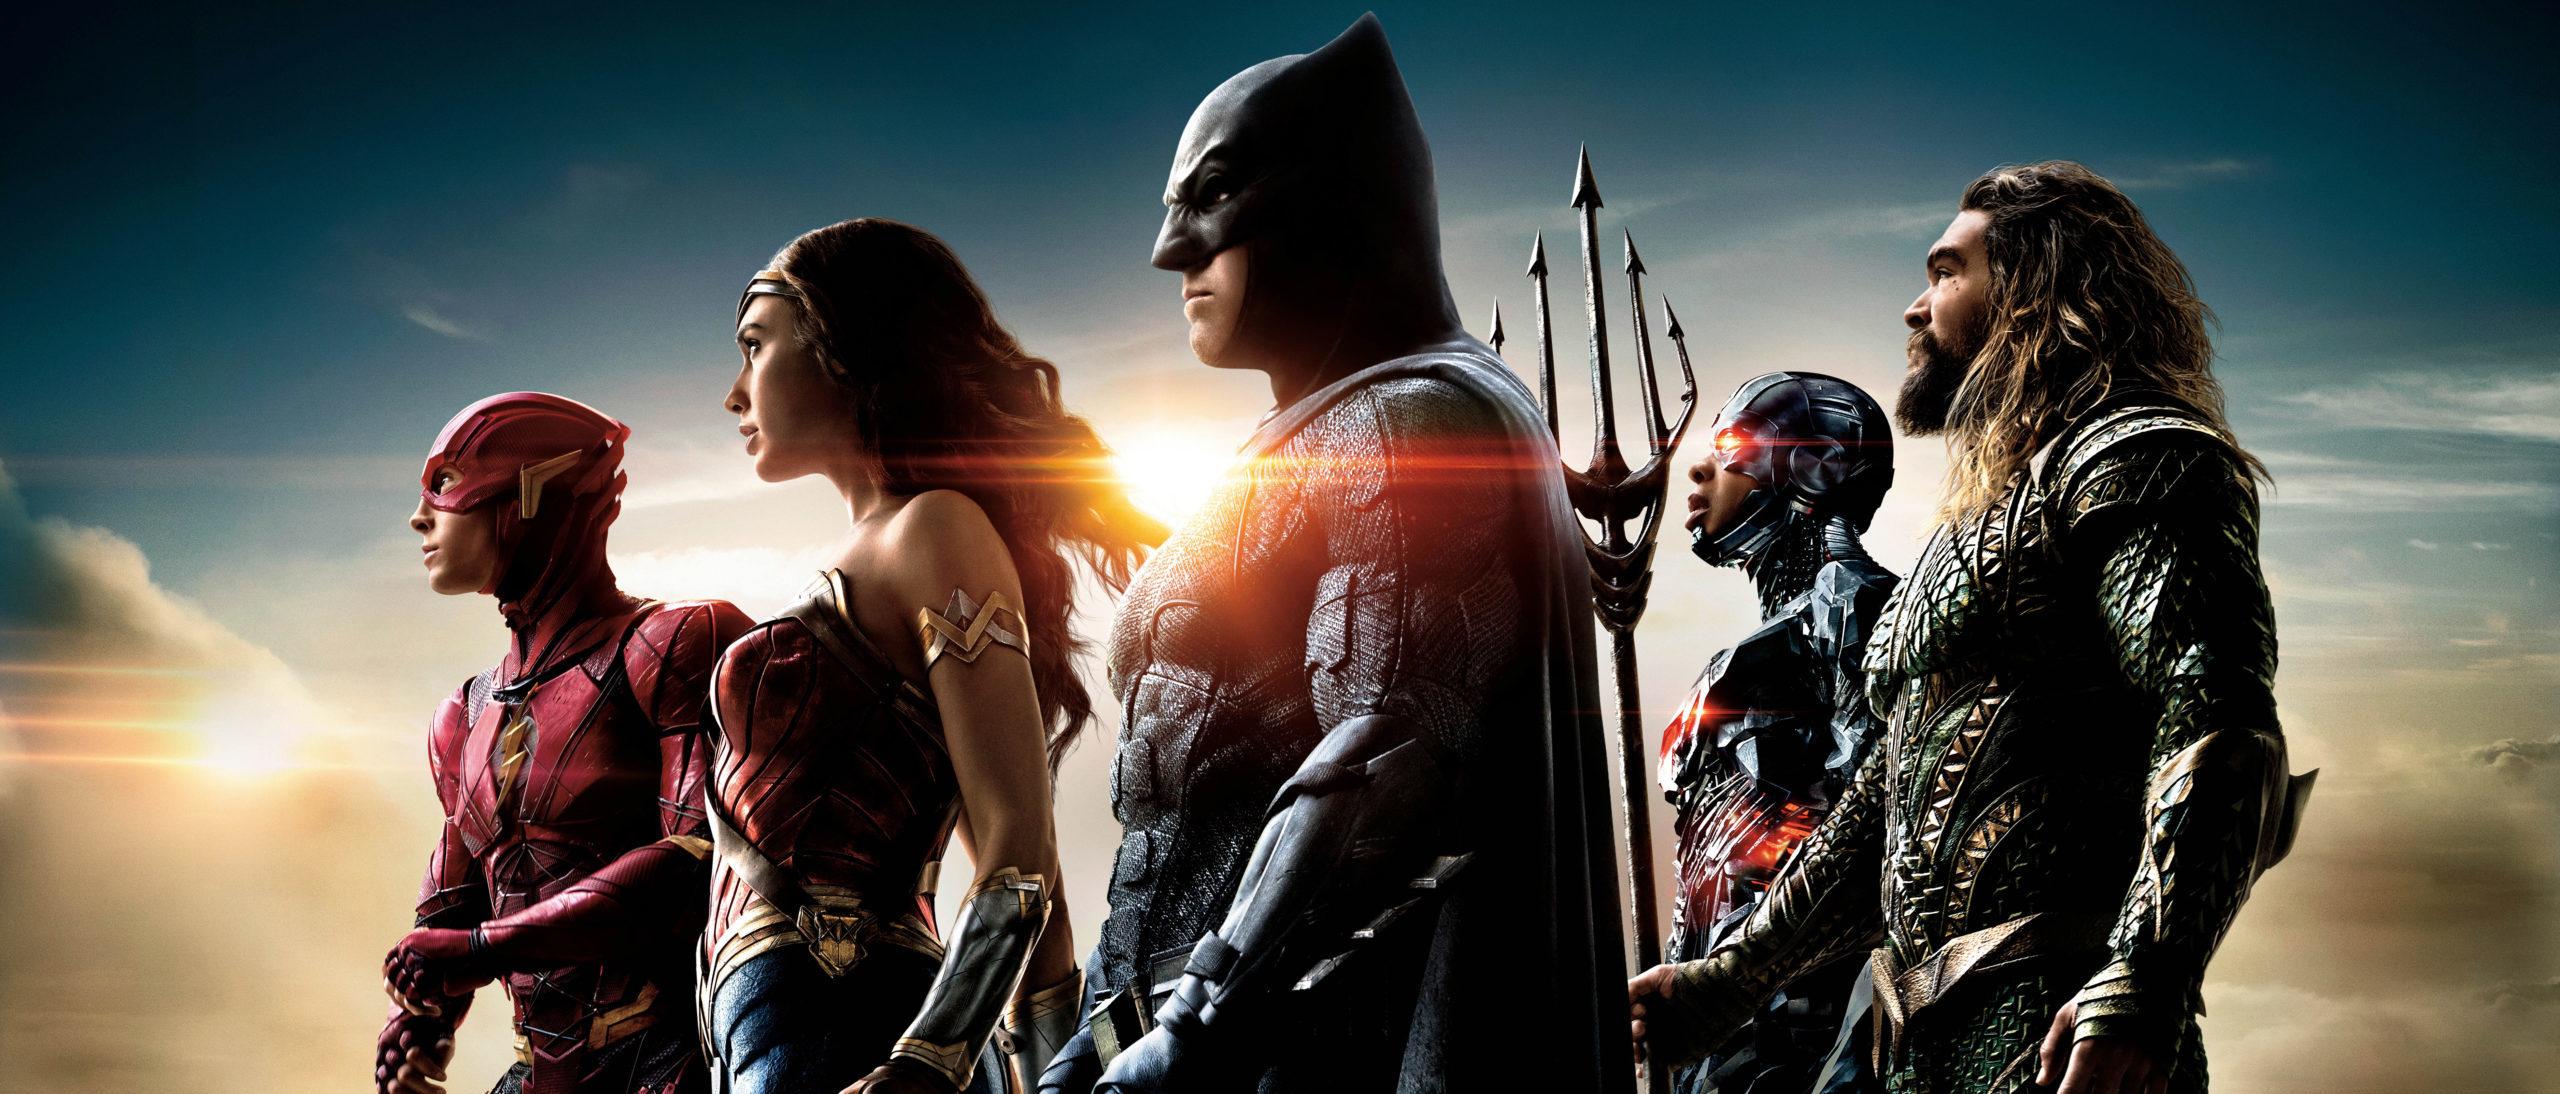 justice-league zack snyder teaser trailer dc comics